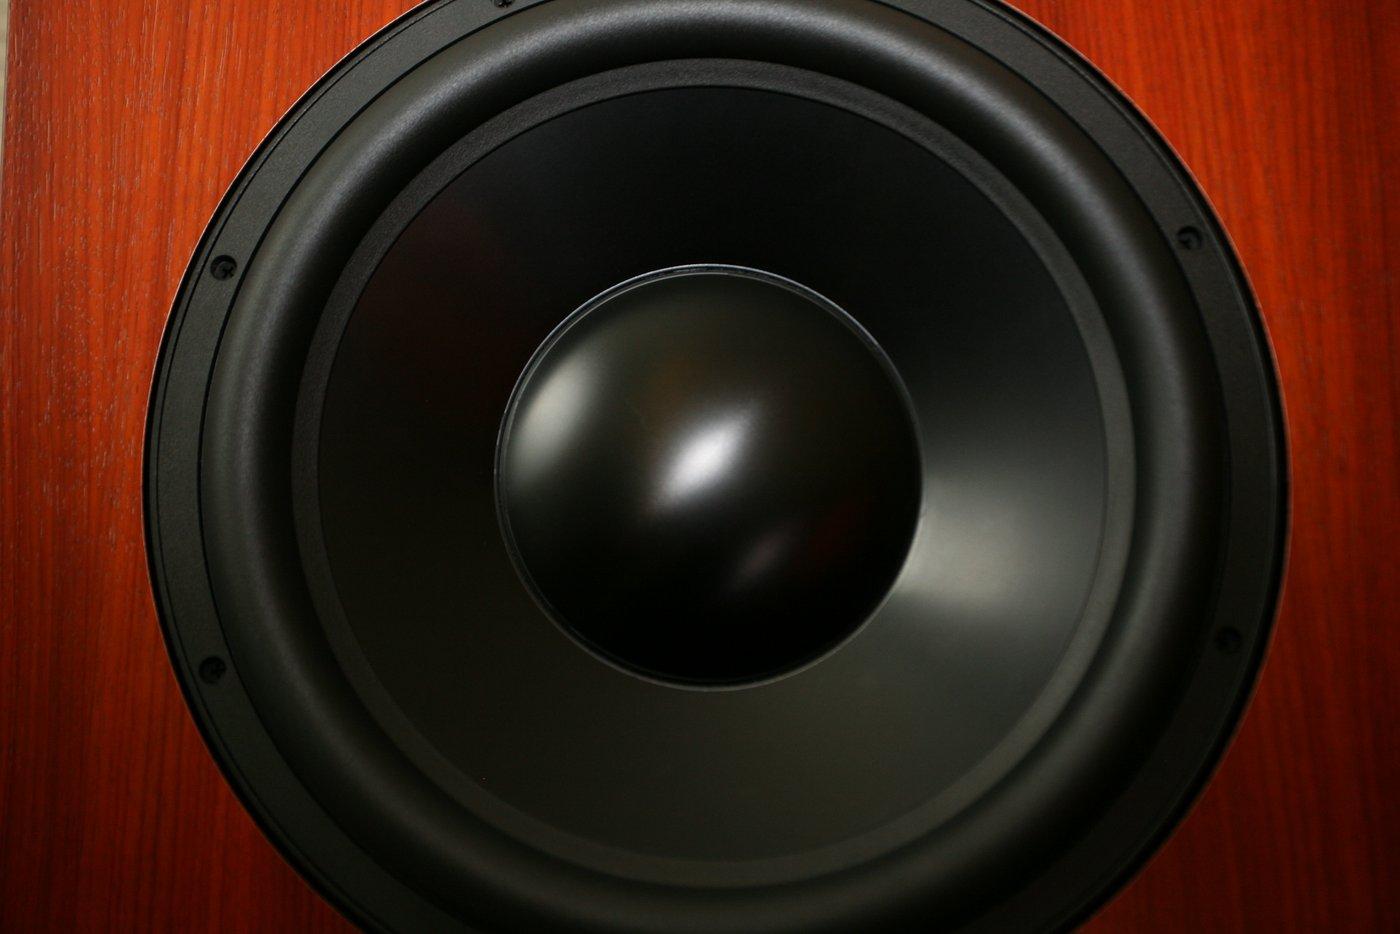 sveda audio - studio & home audio solutions